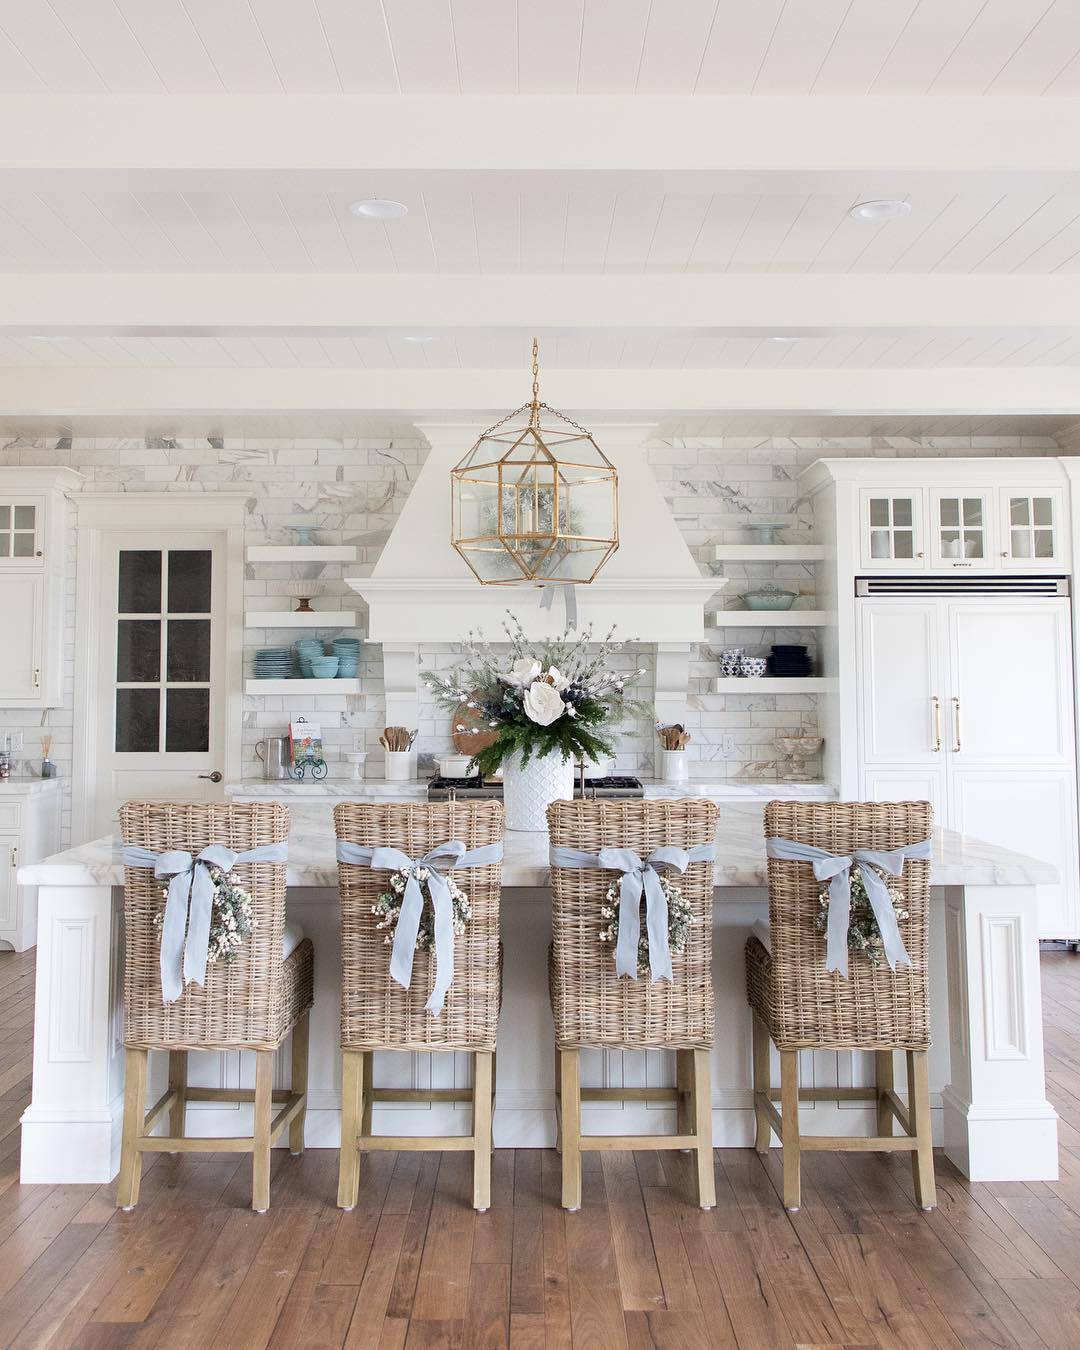 #homedecoration via  @homewithhollyj